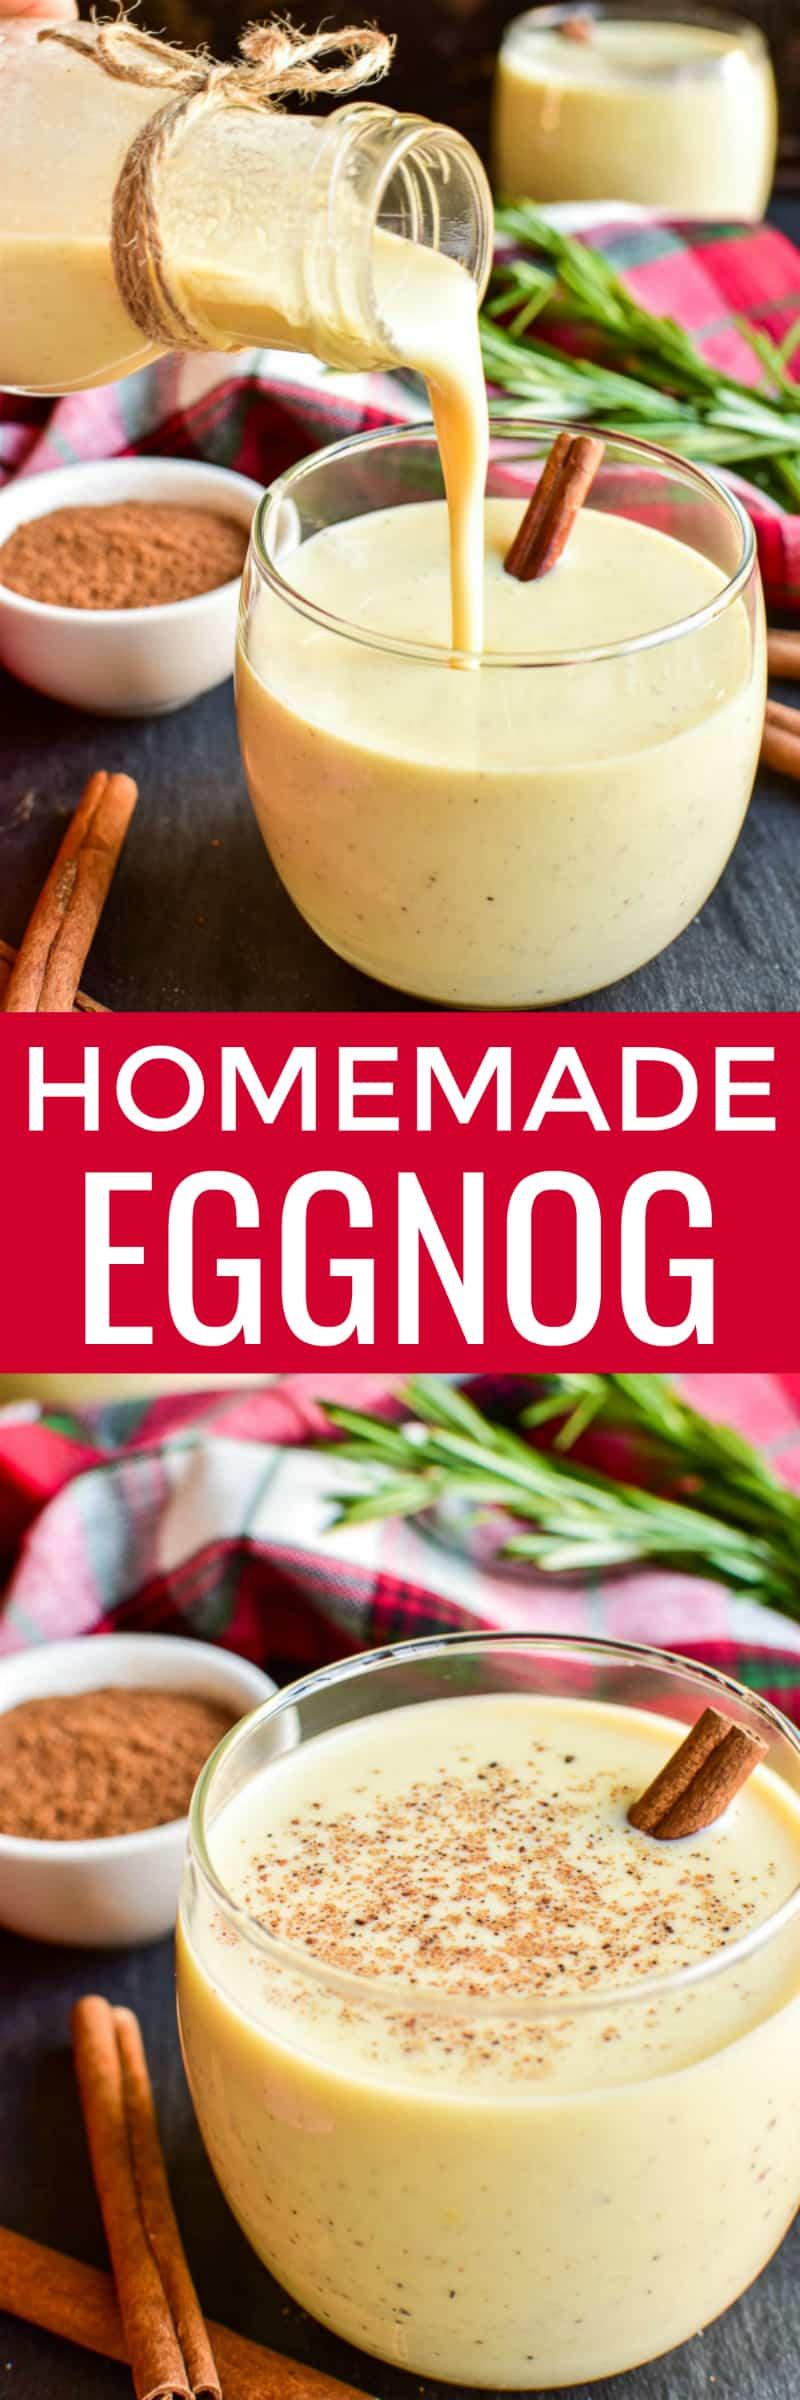 Collage image of Homemade Eggnog